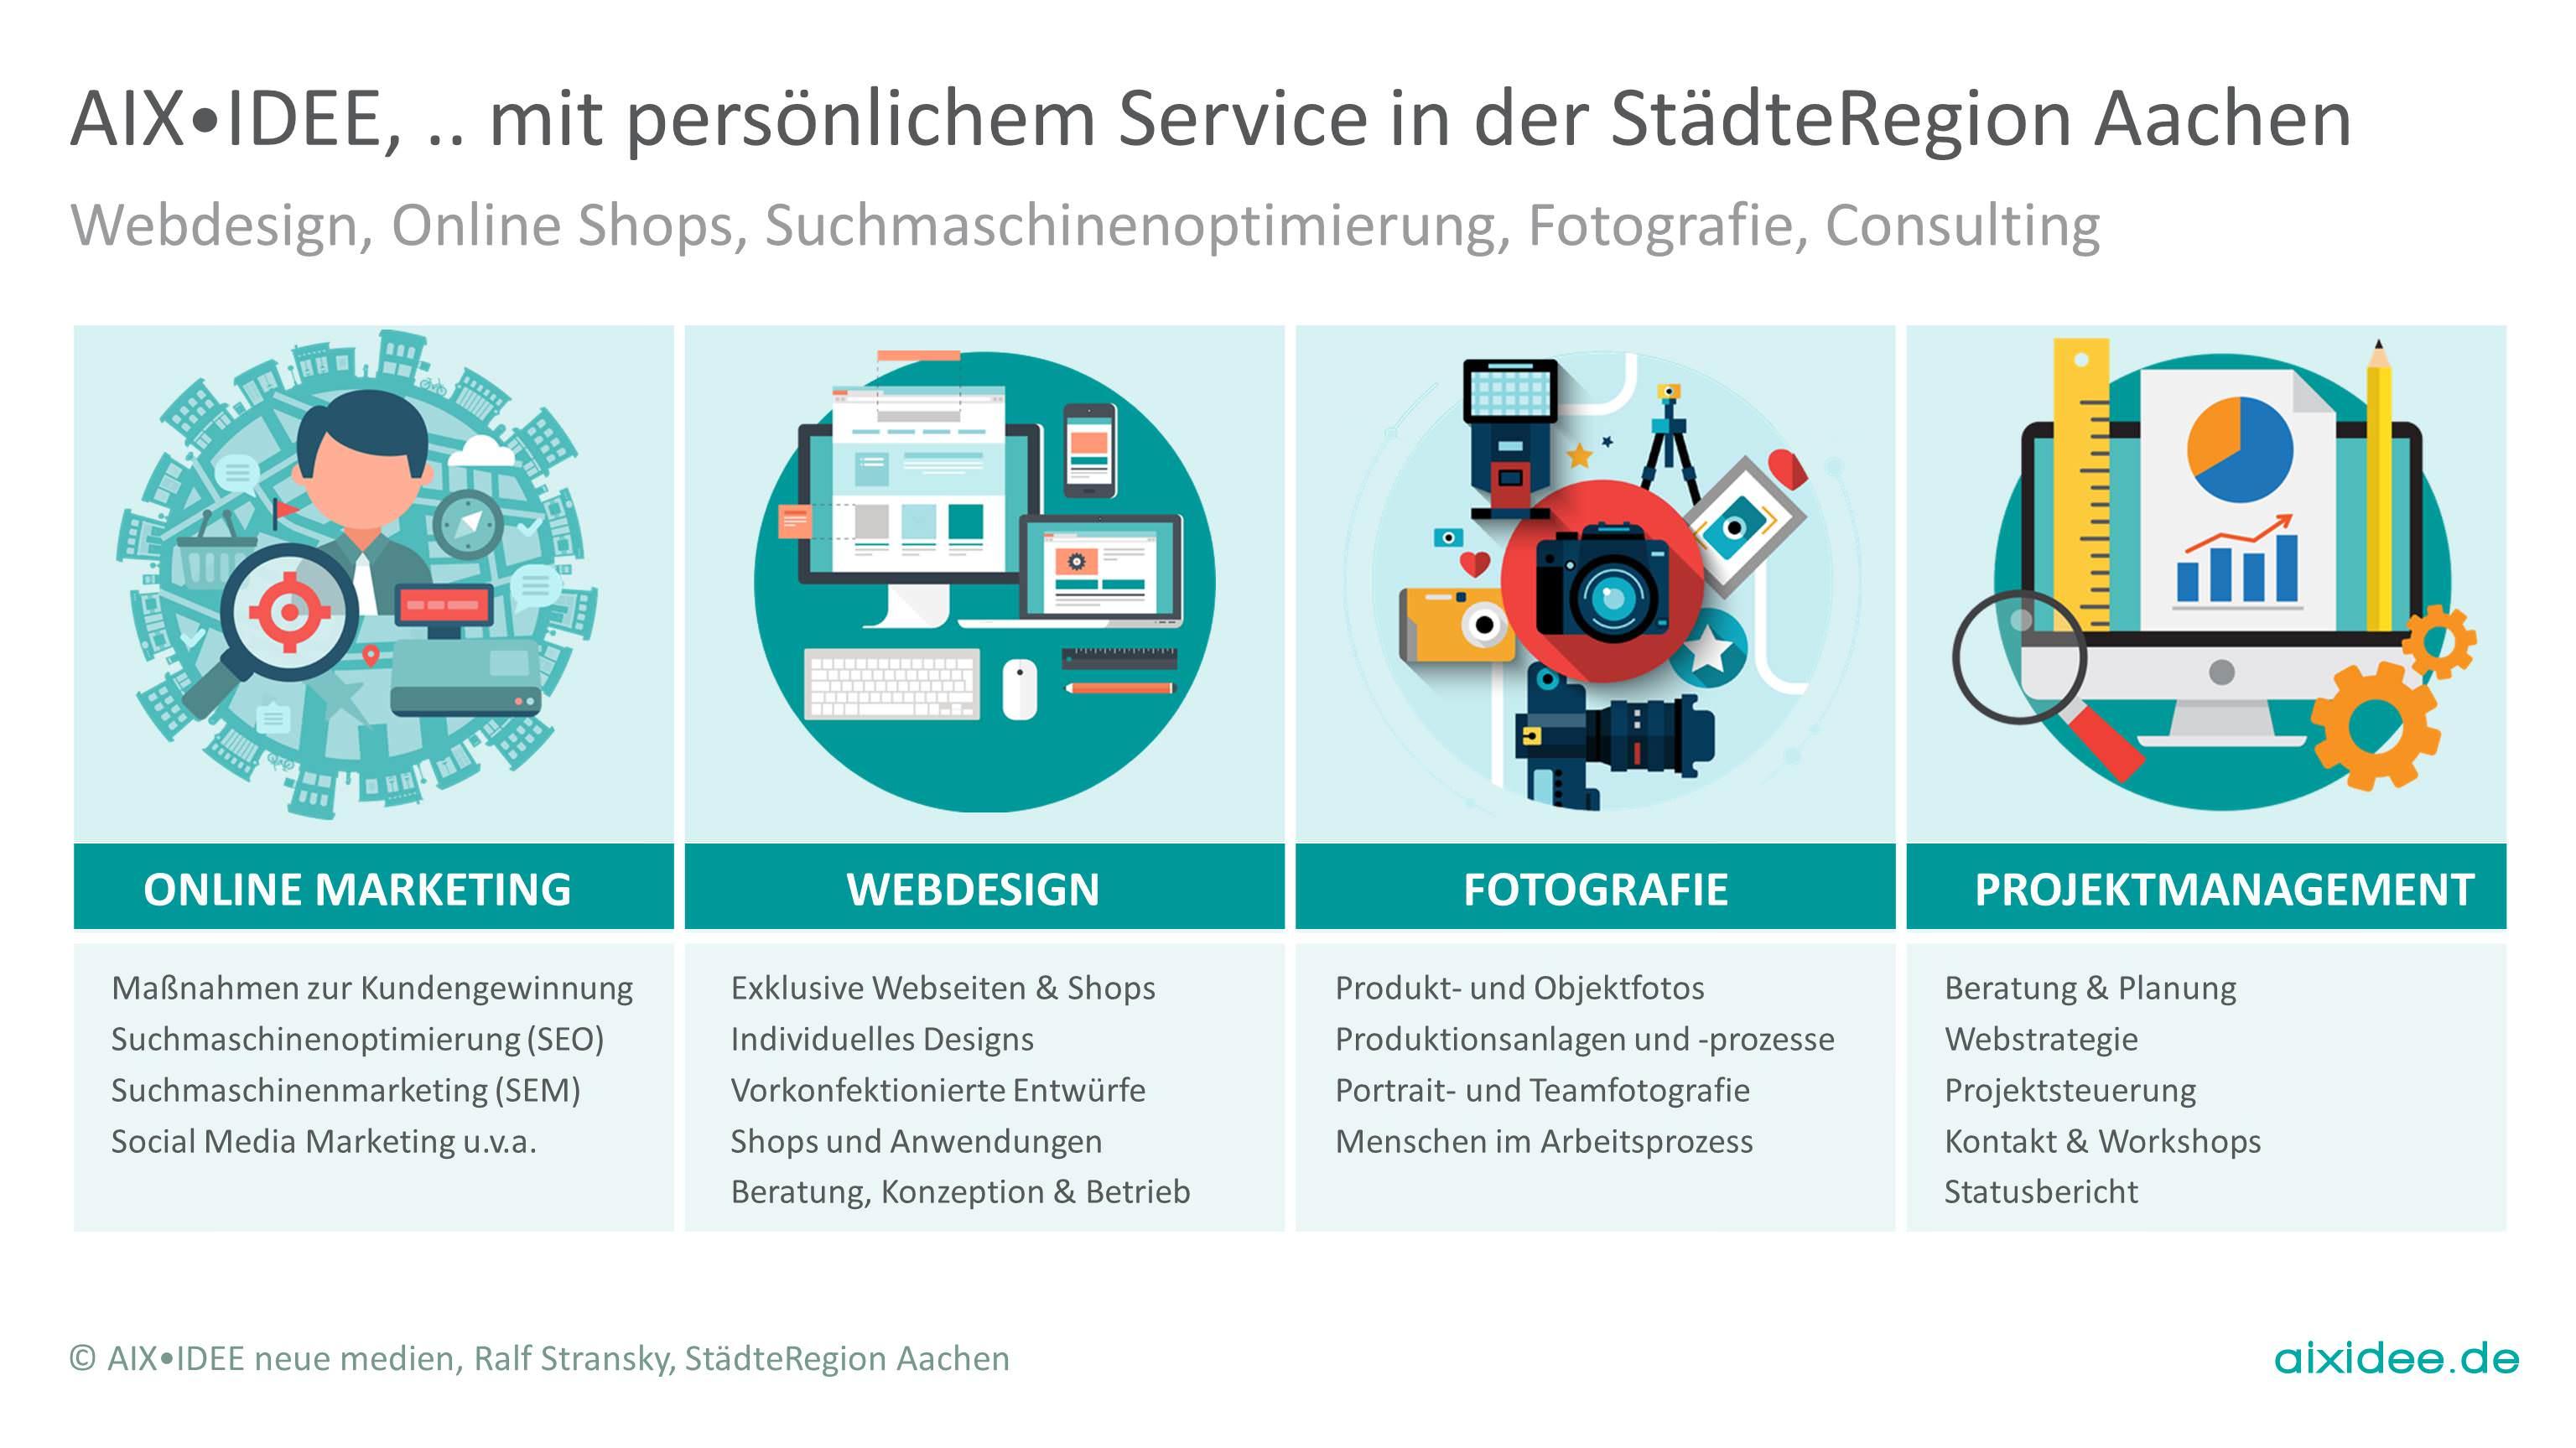 Webdesign, Online Shops, Suchmaschinenoptimierung, Fotografie, Consulting